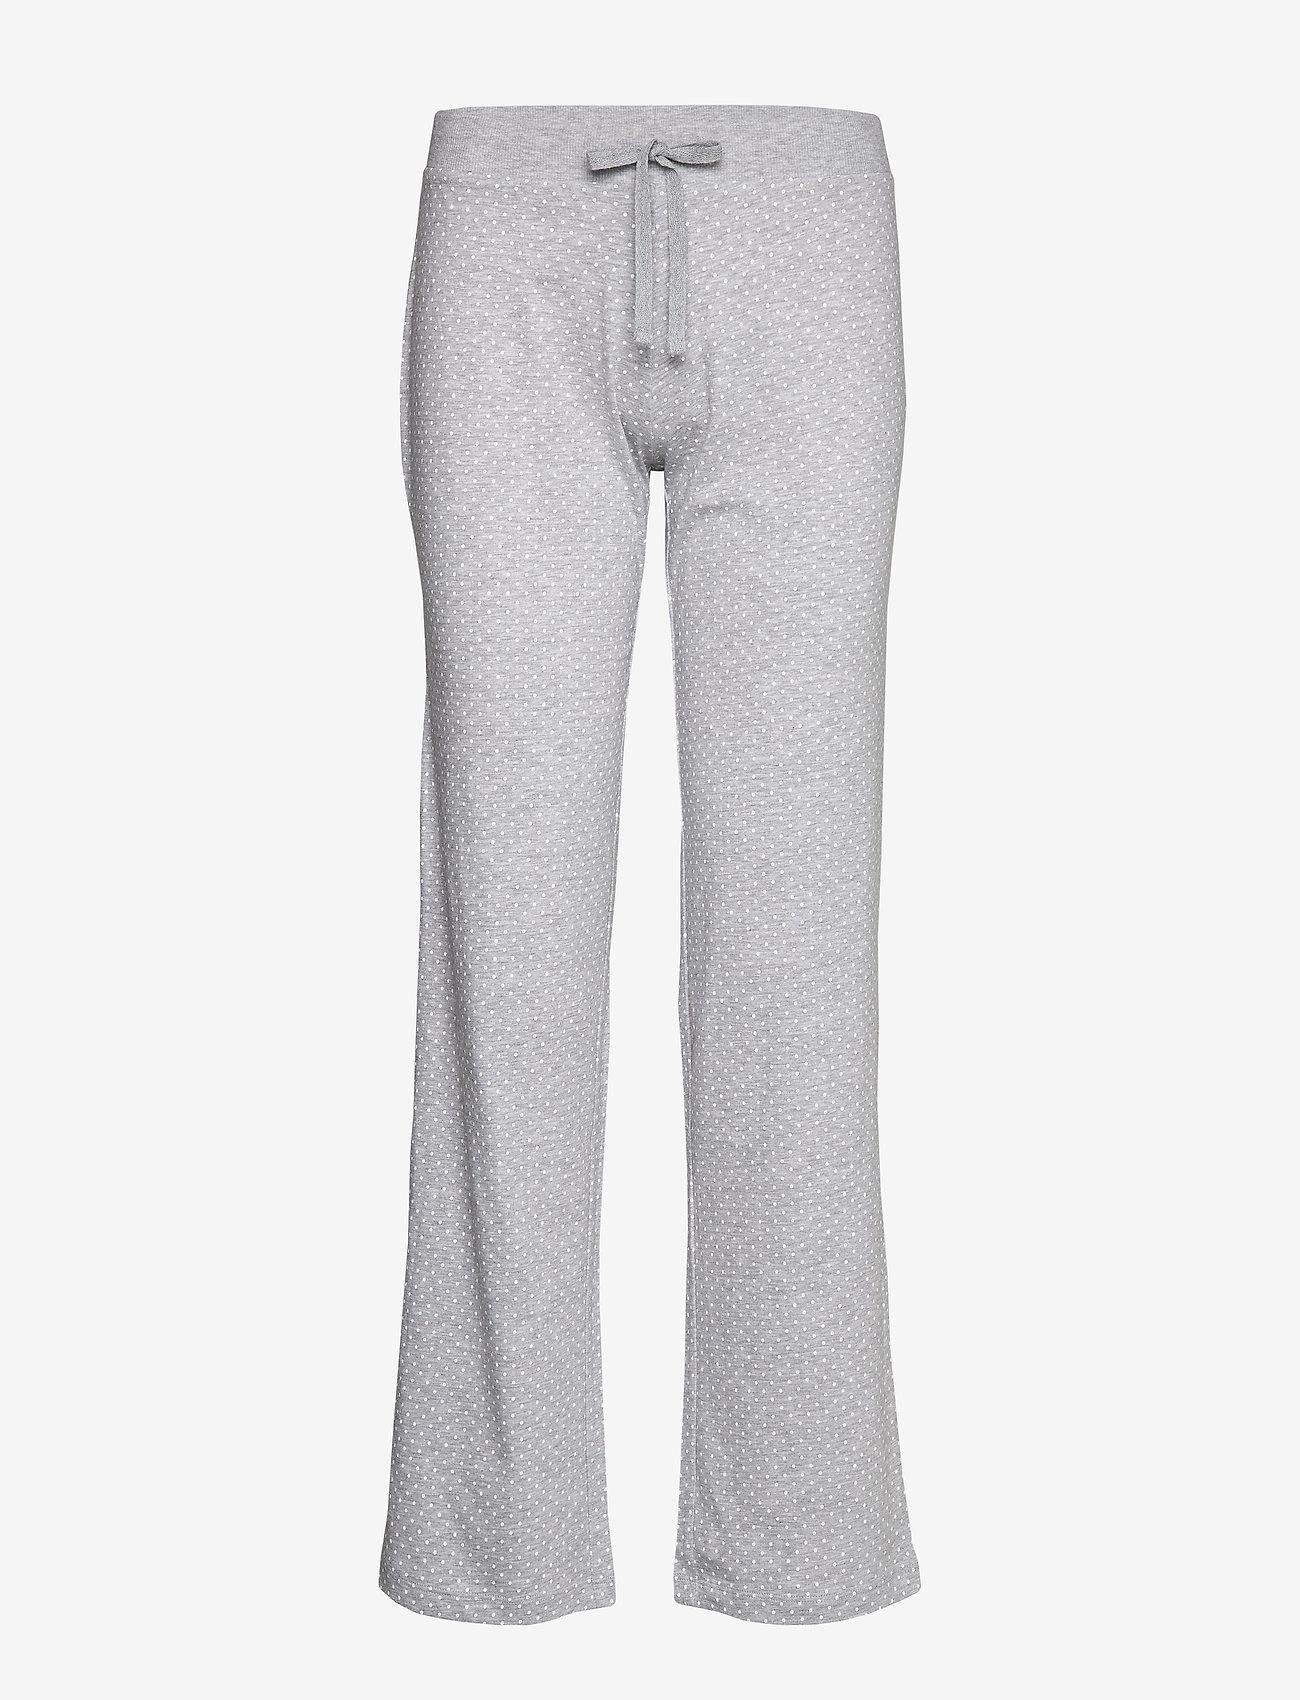 Esprit Bodywear Women - Nightpants - bottoms - light grey - 0